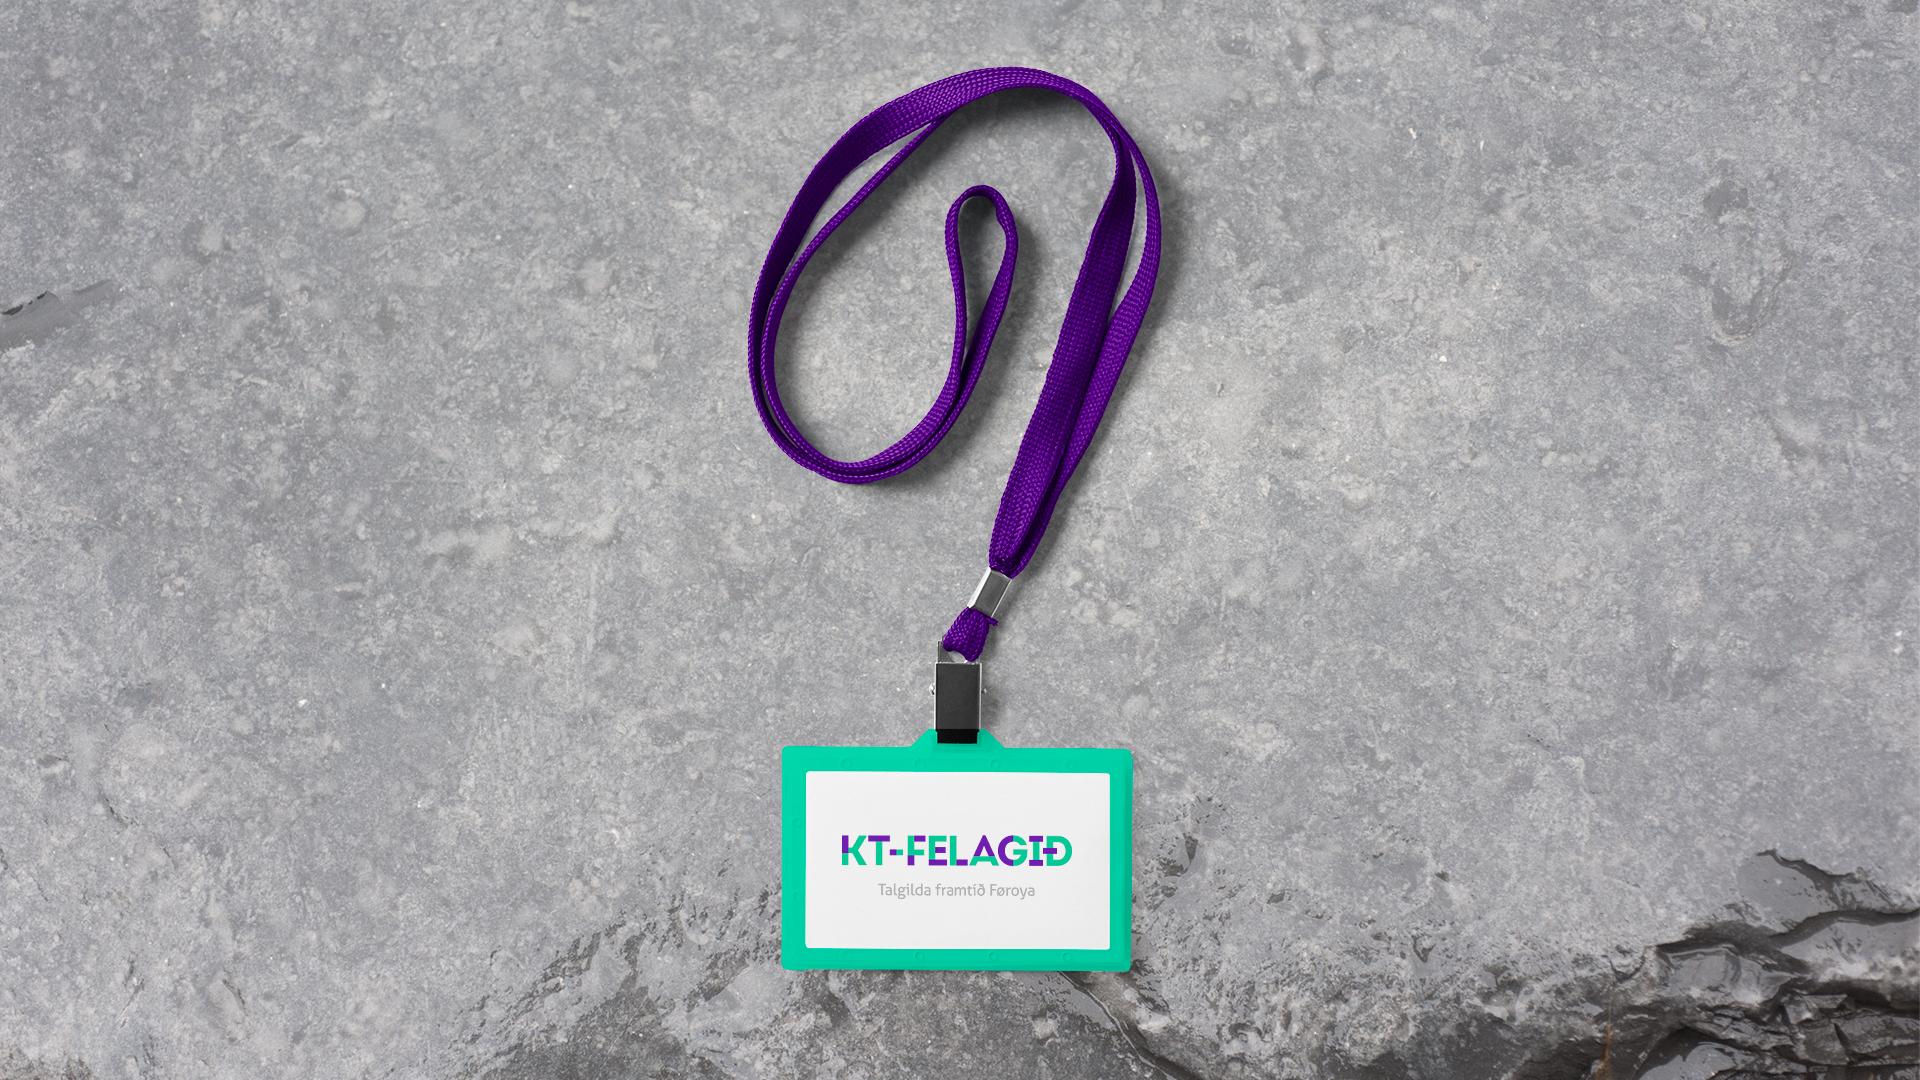 KT-Felagid_ID_Card_Holder_Mock-up_16.9.jpg